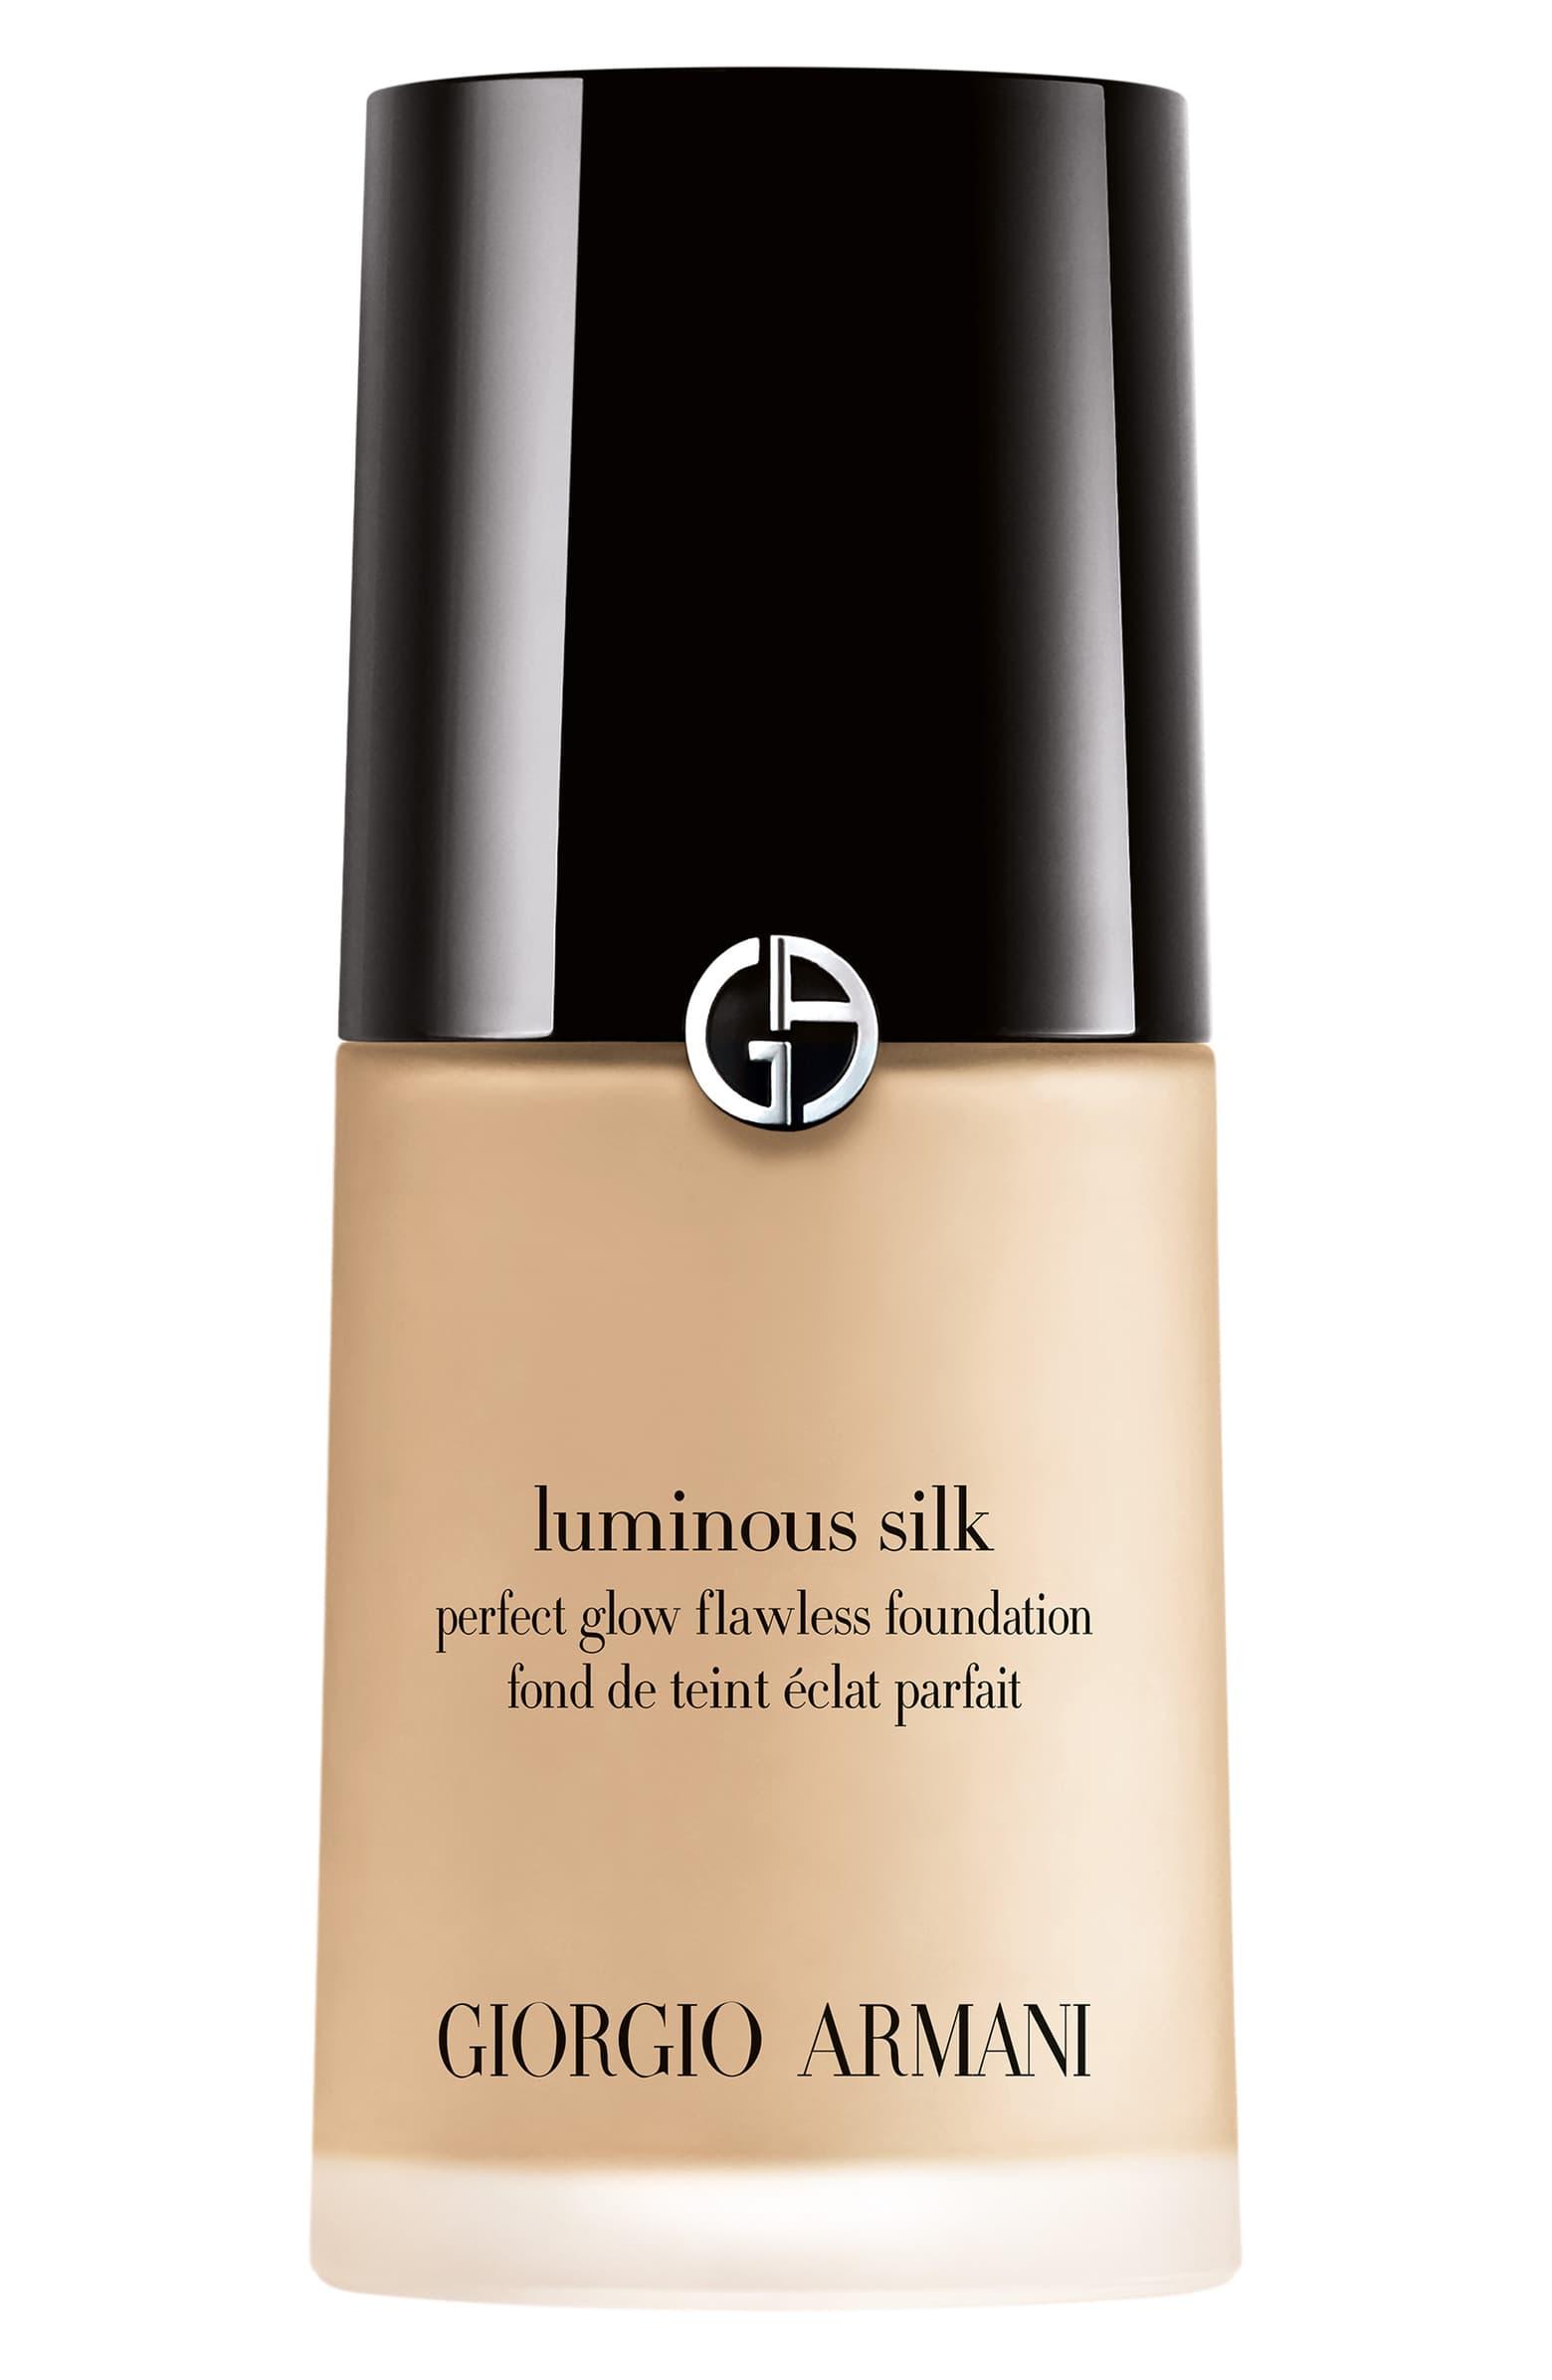 Armani Beauty 4 Luminous Silk Foundation Dupes